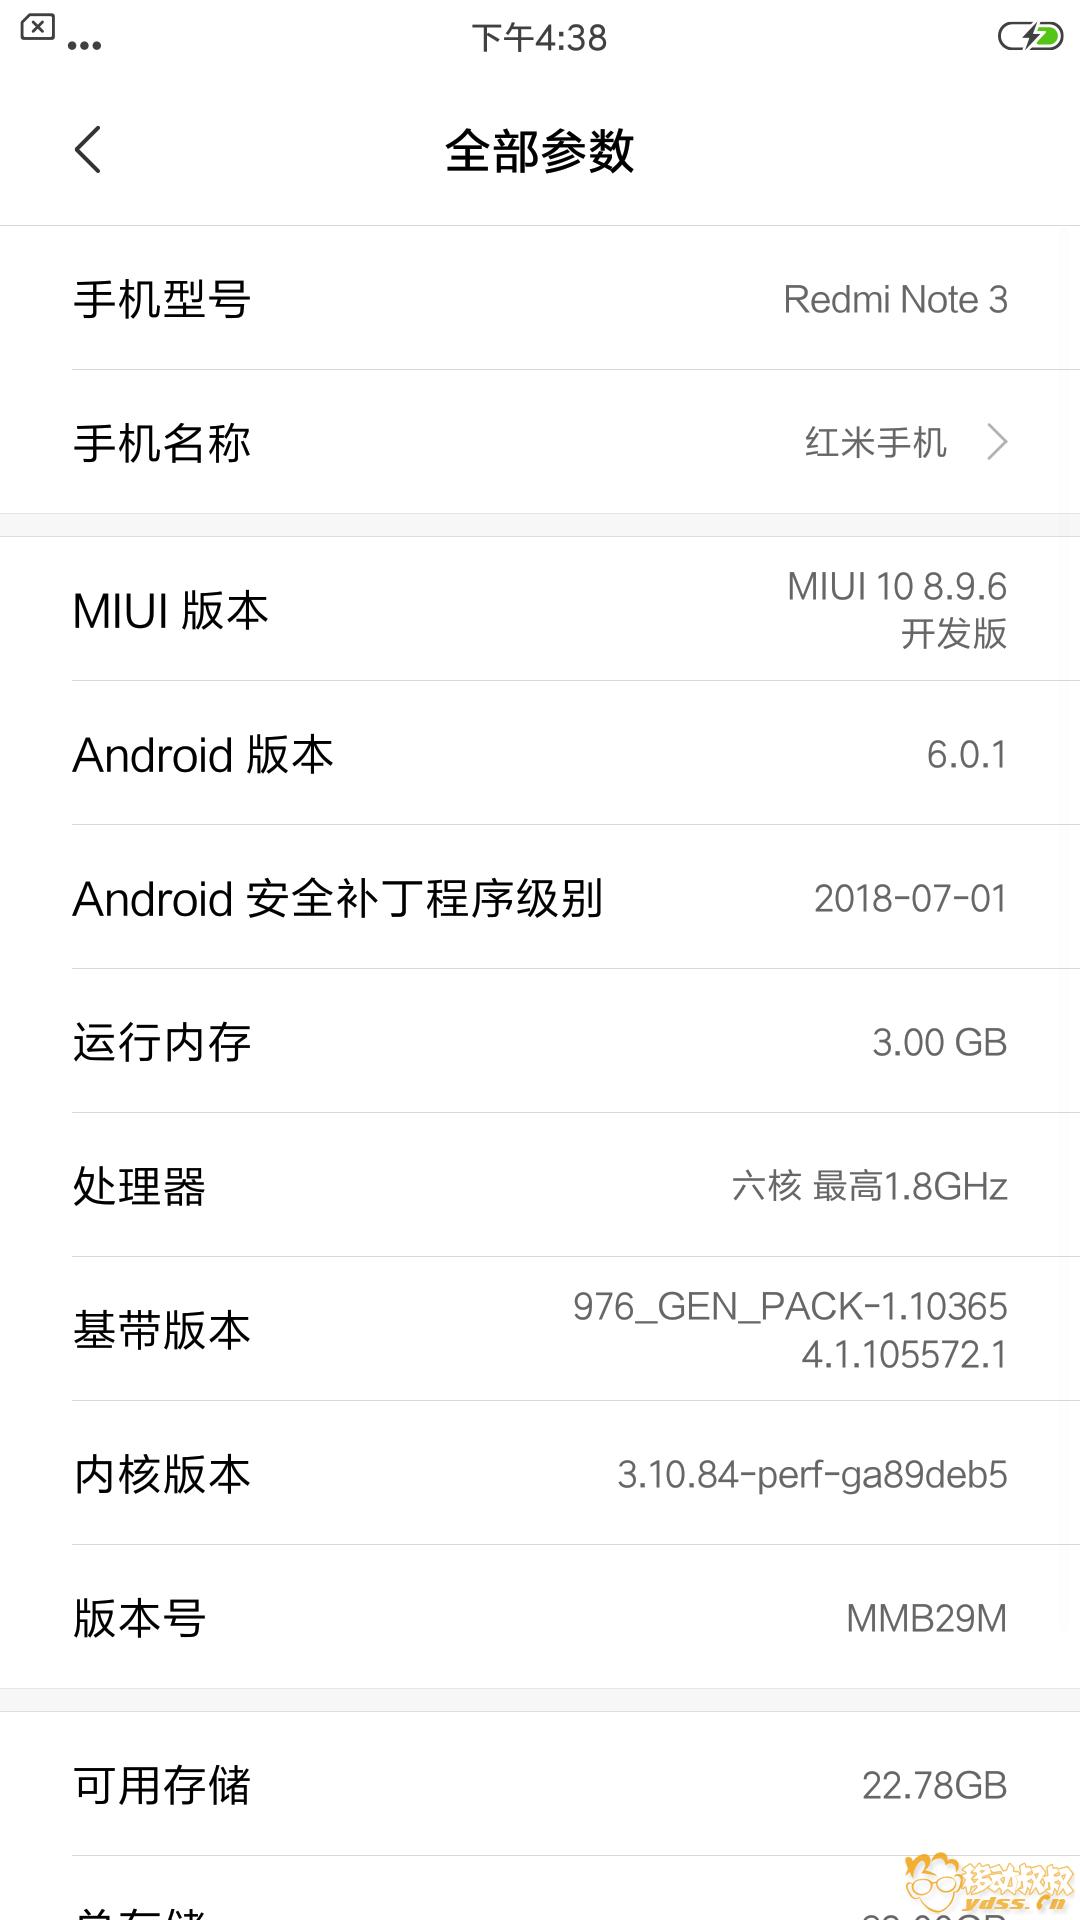 Screenshot_2018-09-08-16-38-36-153_com.android.settings.png